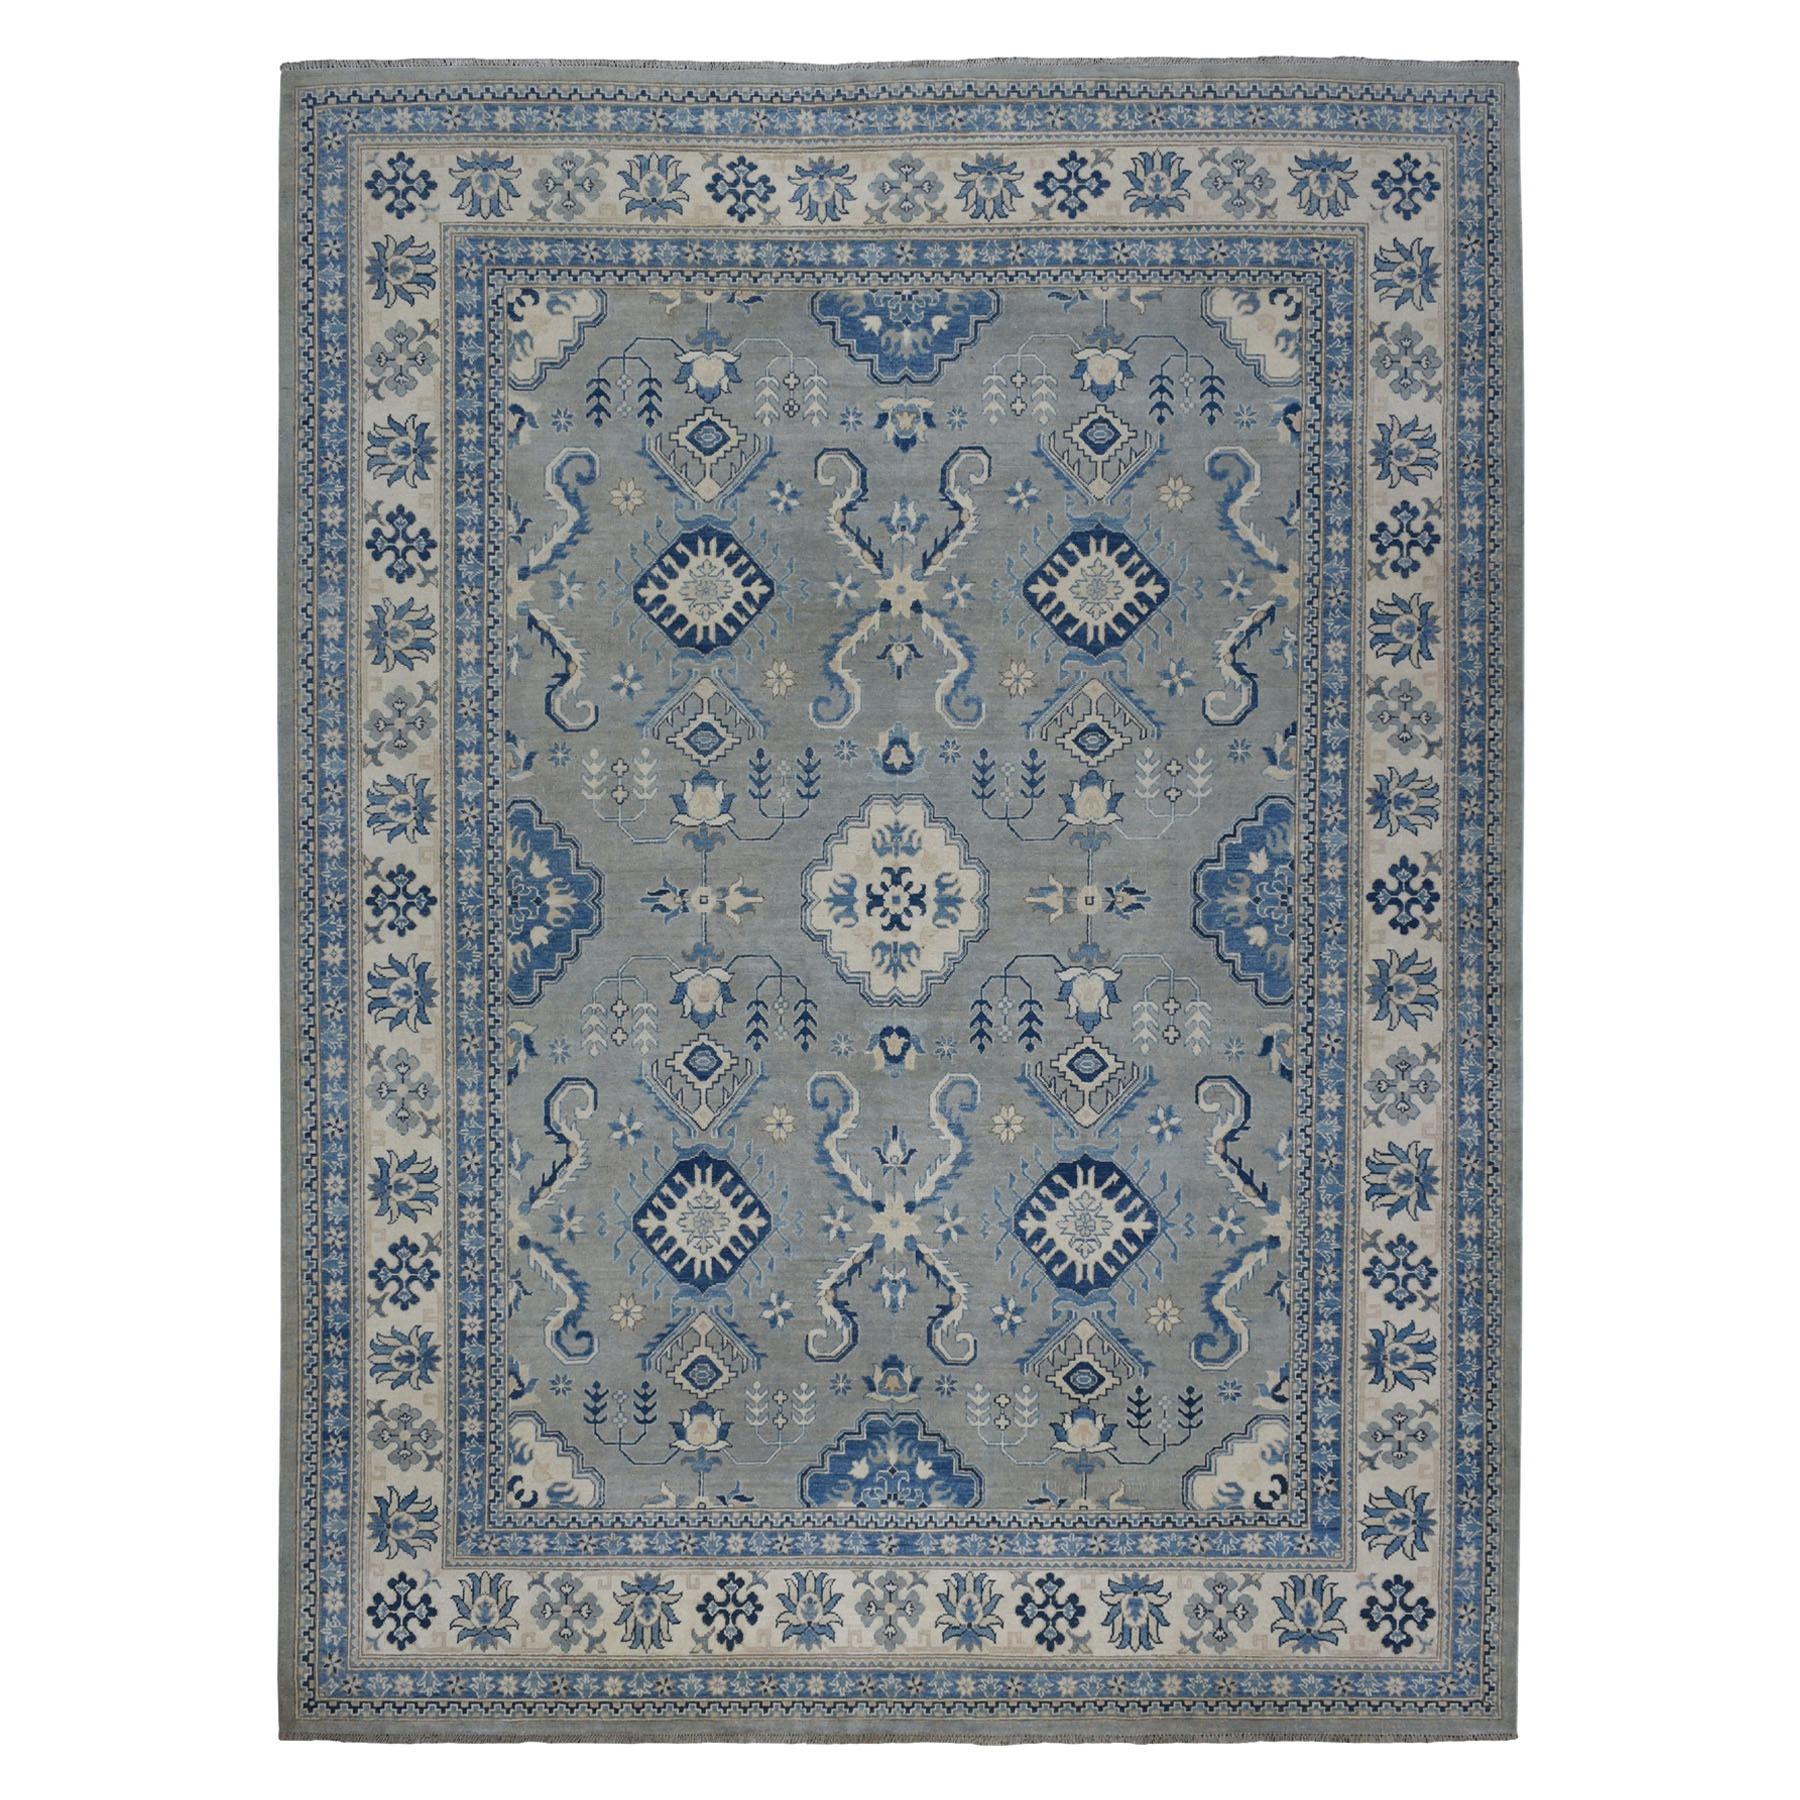 "8'10""X11'5"" Gray Vintage Look Kazak Geometric Design Pure Wool Hand Knotted Oriental Rug moaebb77"